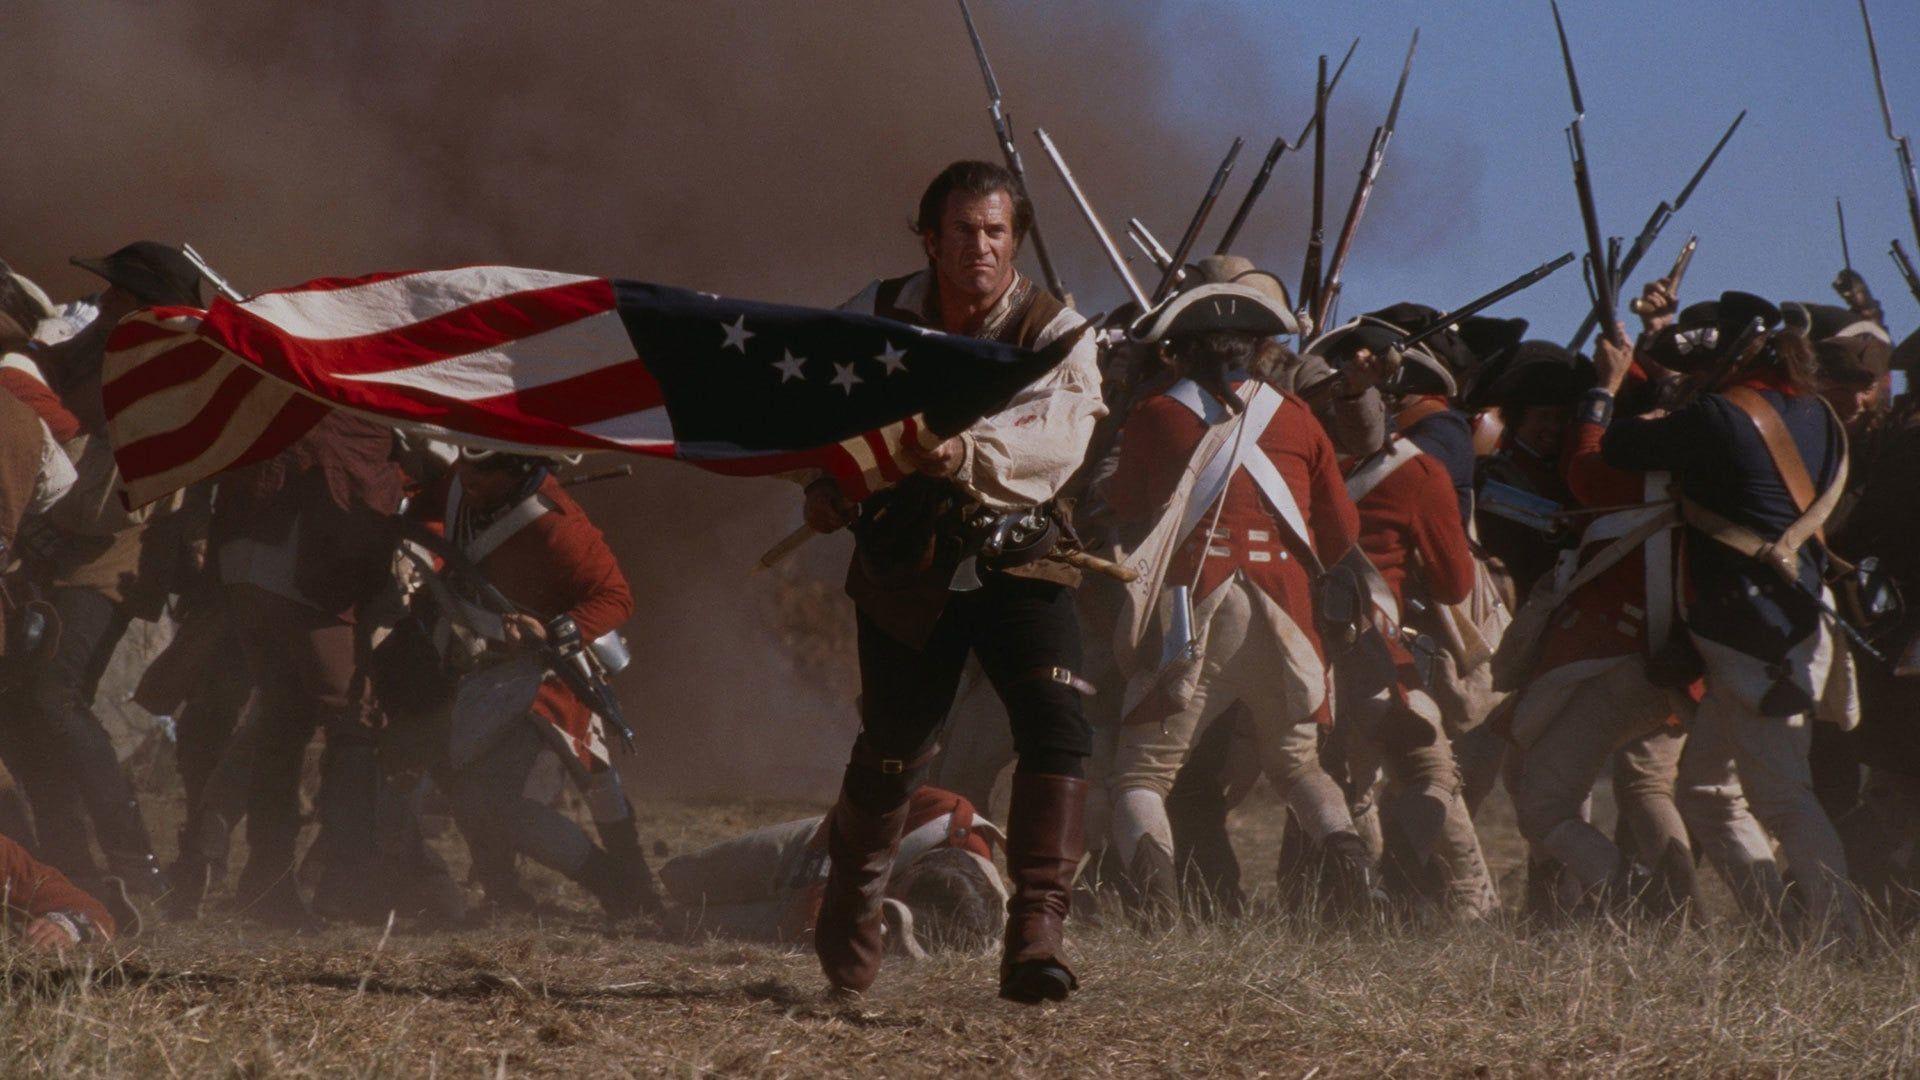 American Historical Film The Patriot